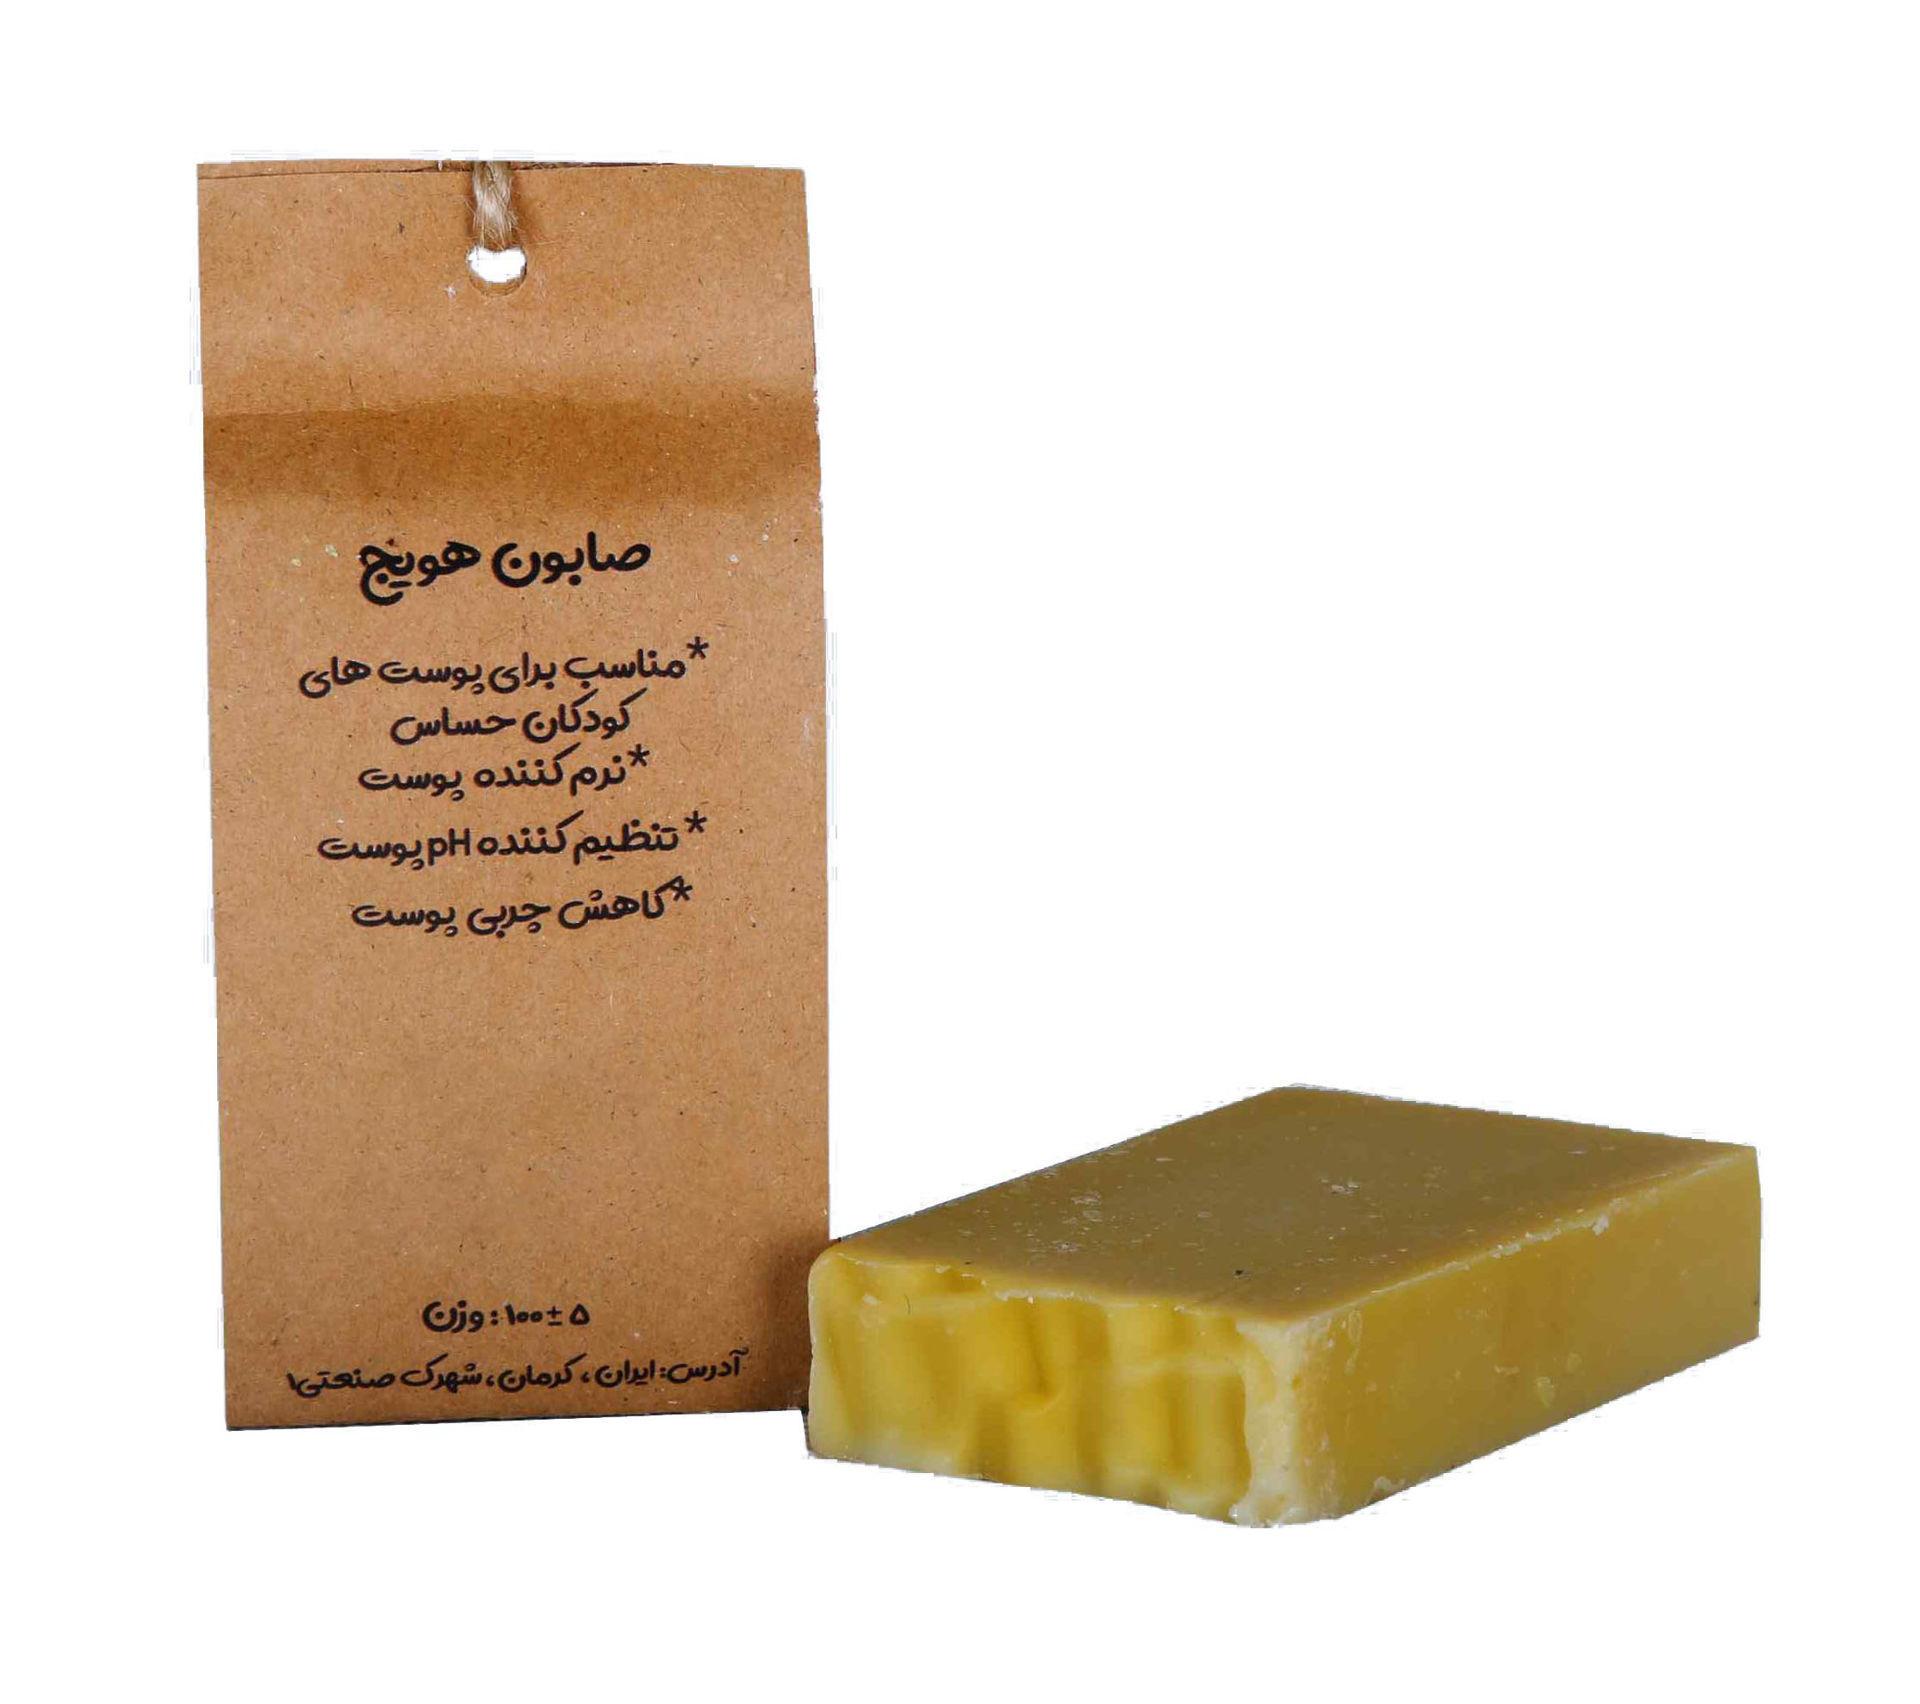 تصویر صابون گیاهی ارگانیک پوست کودک هویج   مناسب برای پوست کودکان و حساس ، نرم کننده پوست ، تنظیم کننده PH پوست ، کاهش چربی پوست